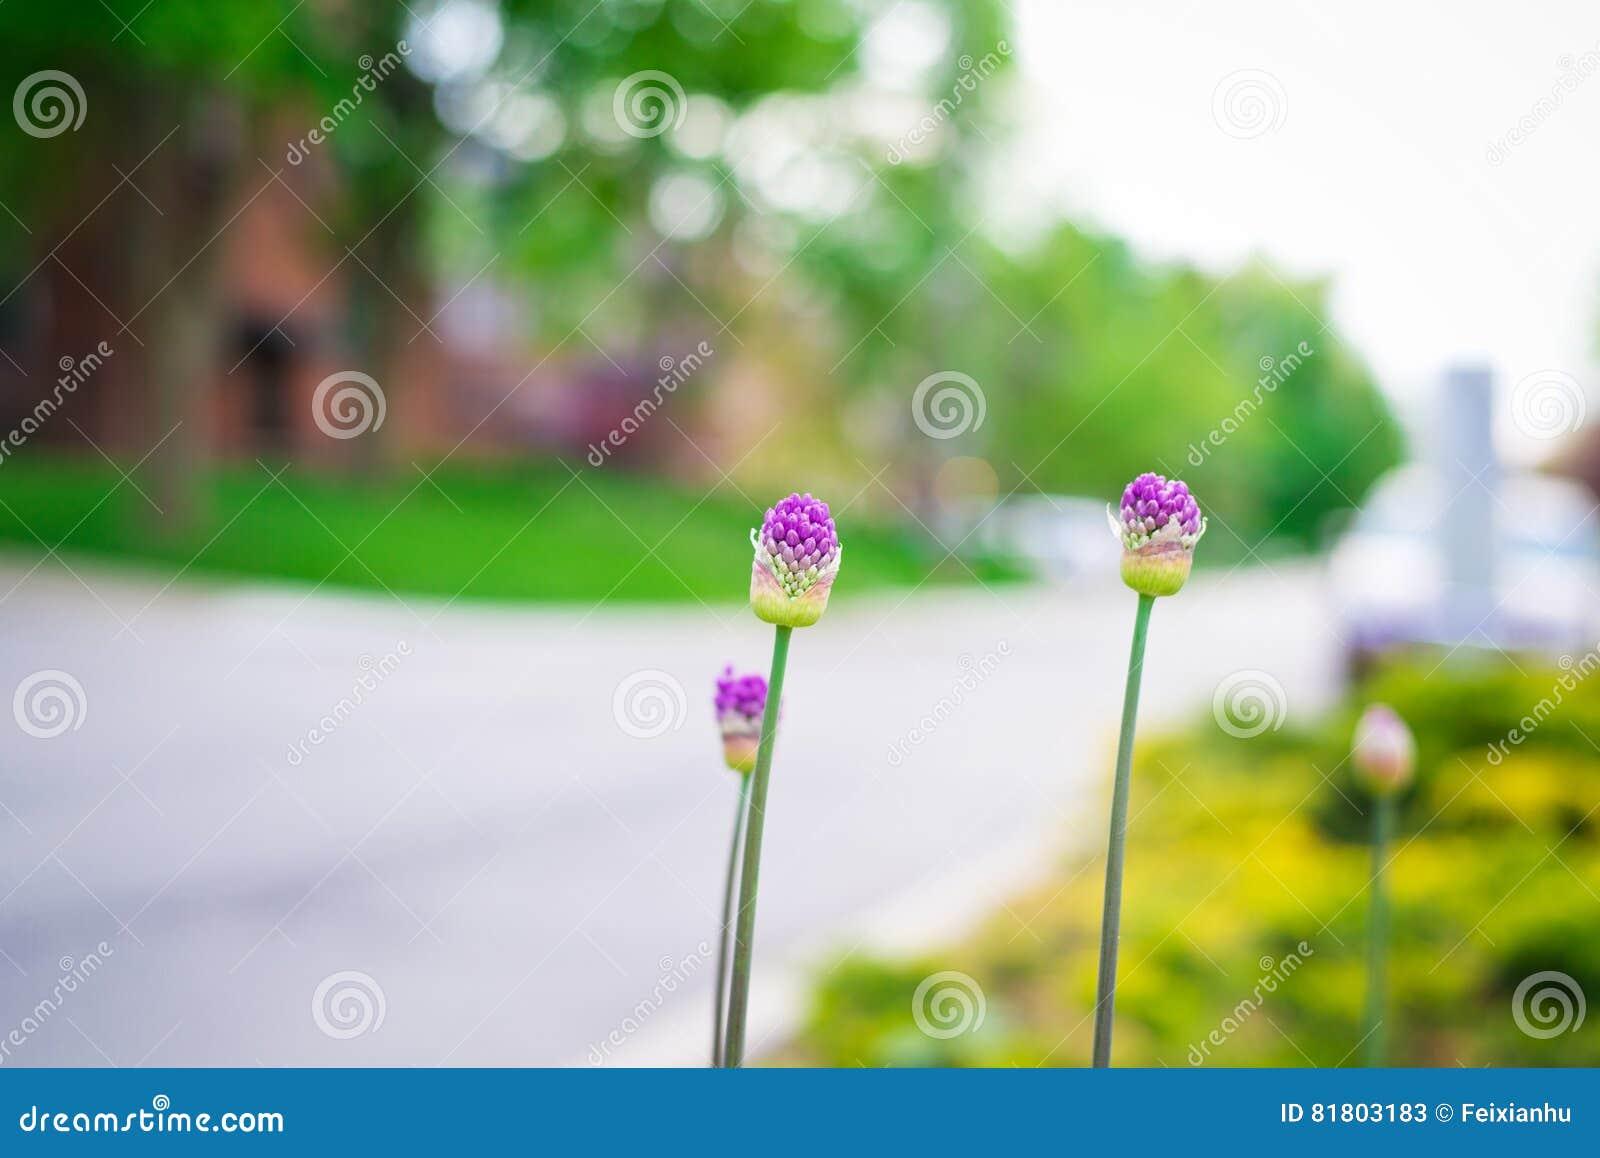 Цветок сирени на стороне дороги